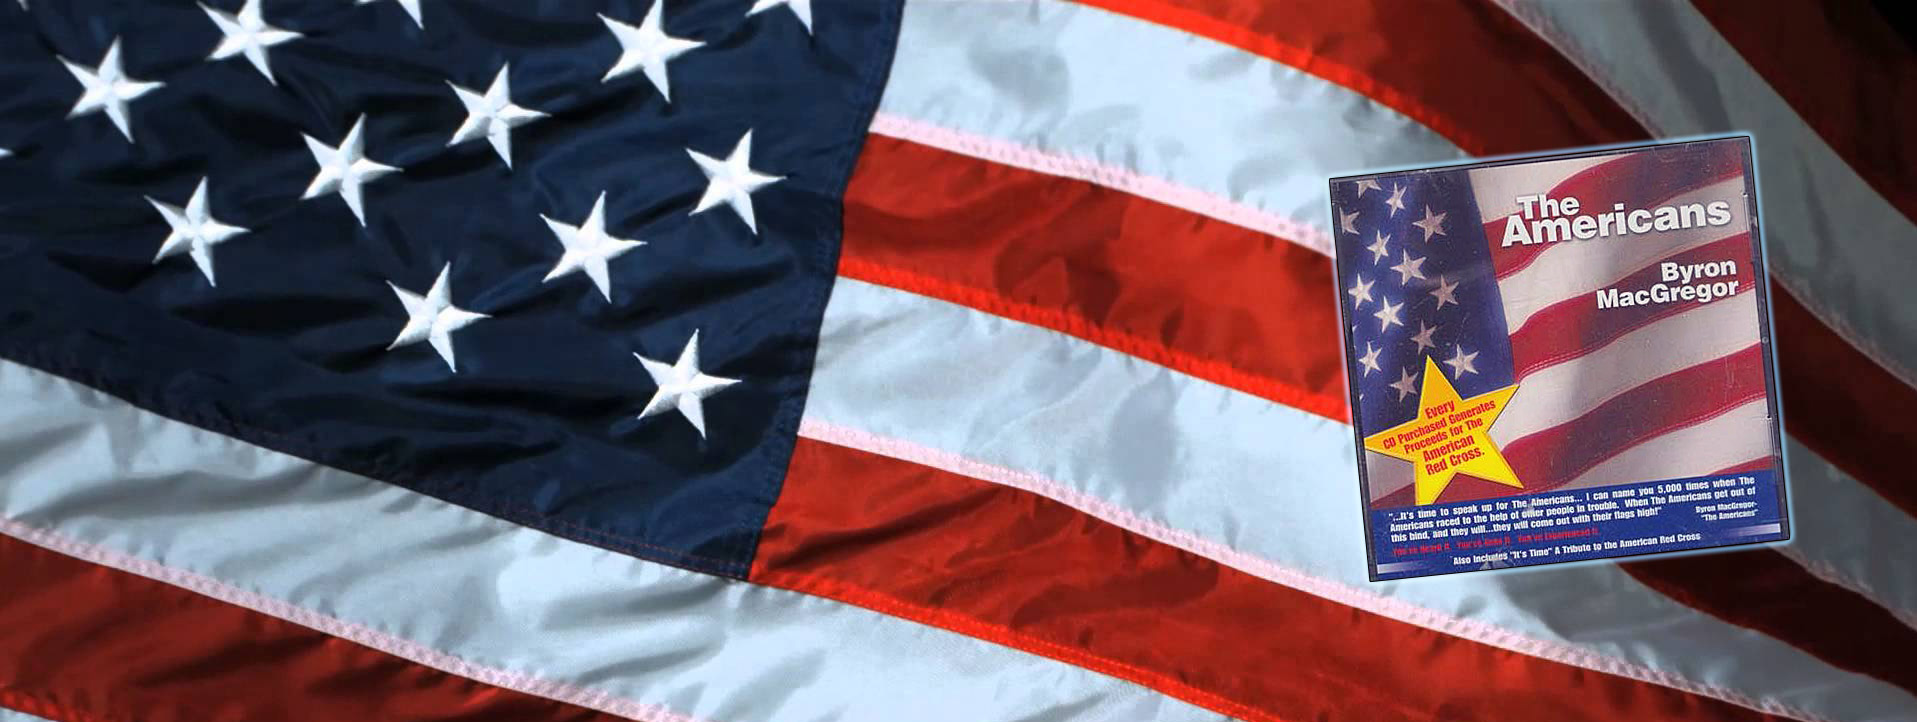 American Flag Byron MacGregor (MCRFB cropped 4)